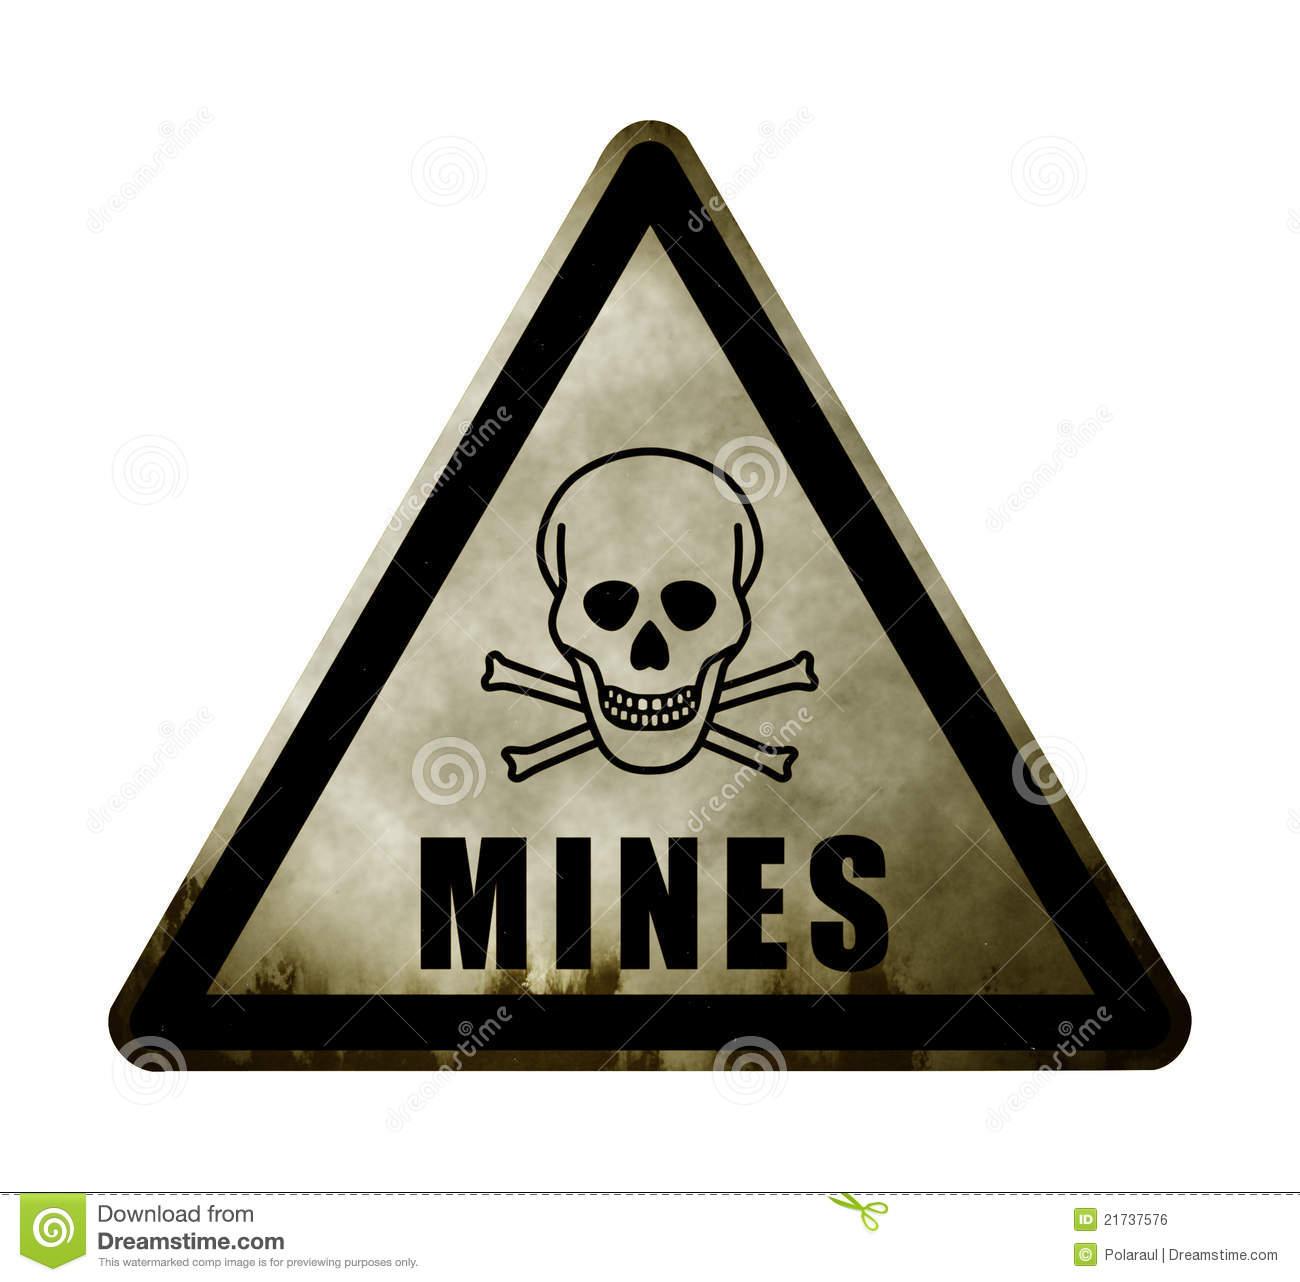 Landmine clipart banner Landmine Clipart | Clipart Panda - Free Clipart Images banner